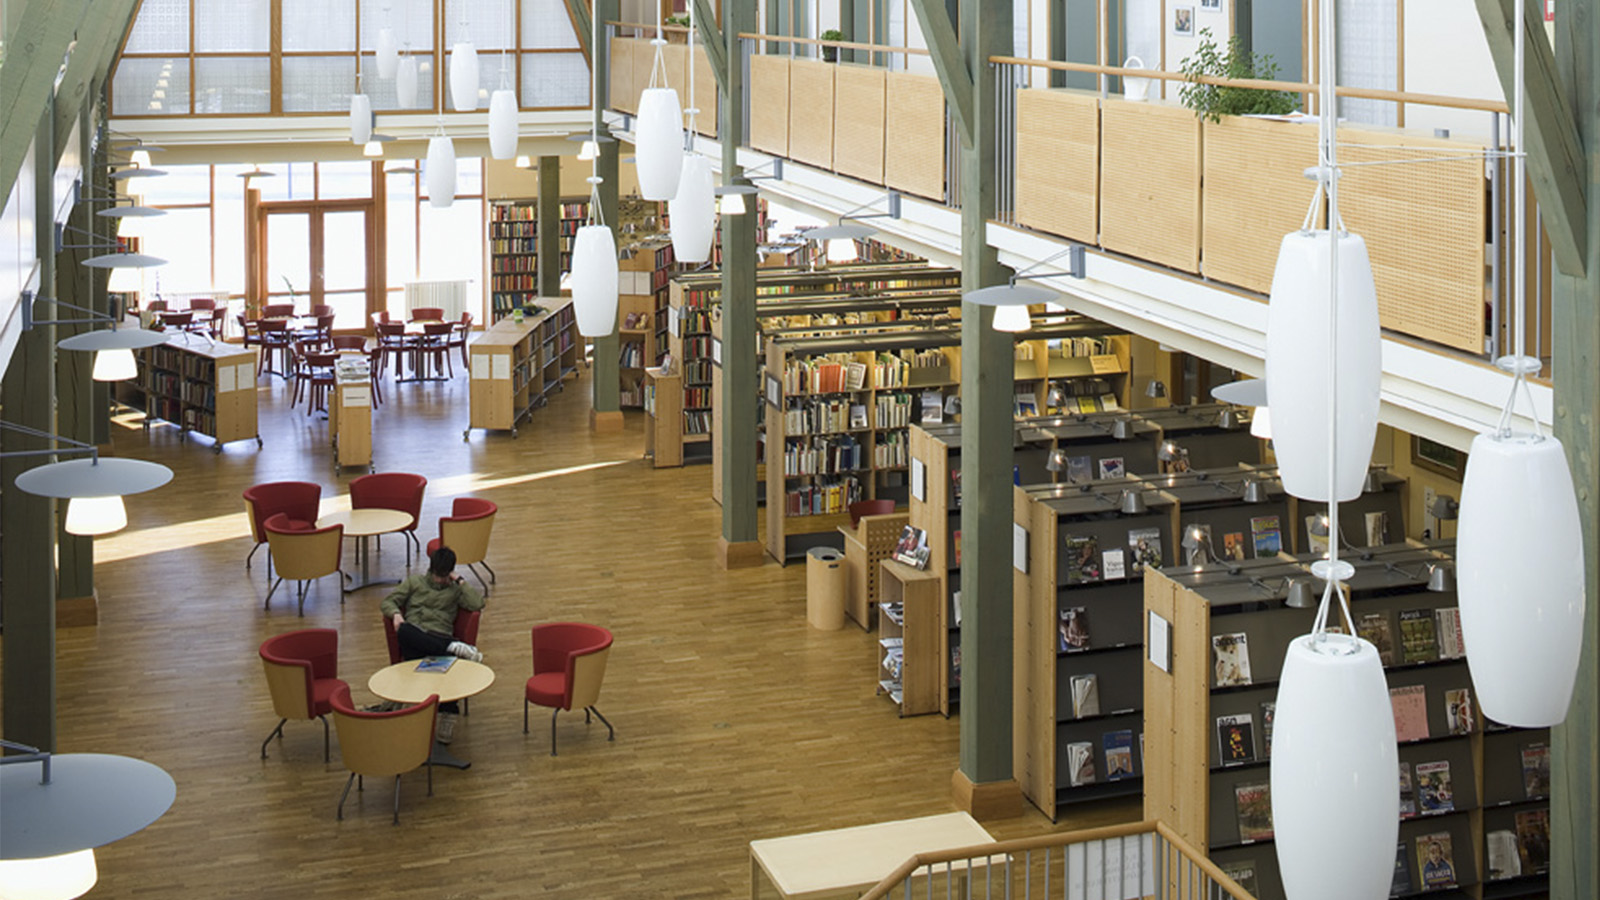 City Library of Eksjö, Sweden